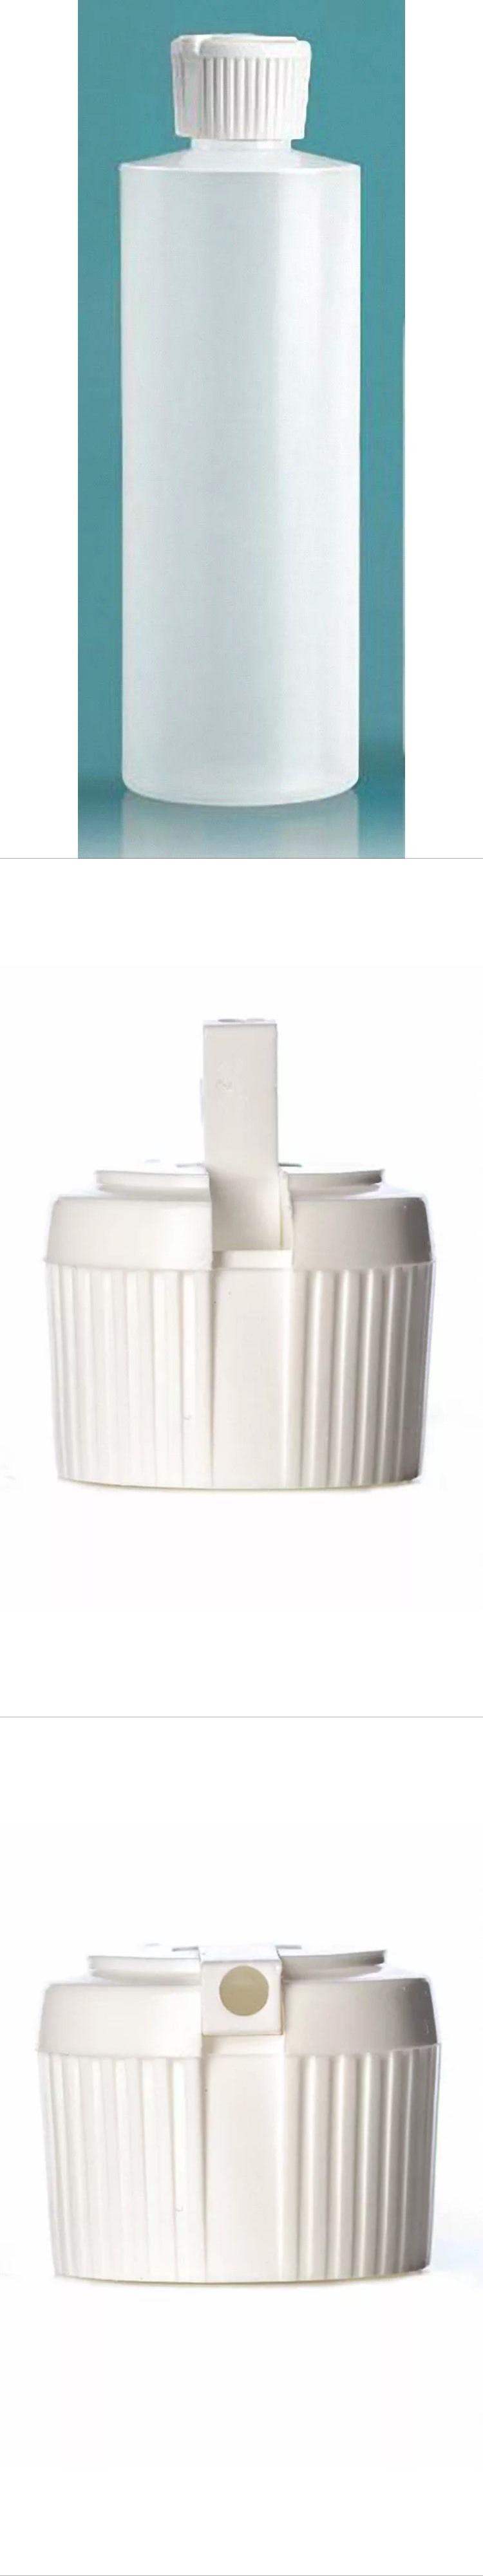 4 oz HDPE Cylinder Round Plastic Bottles w  Polytop Dispensing Caps  (Lot 1aee0685b6e